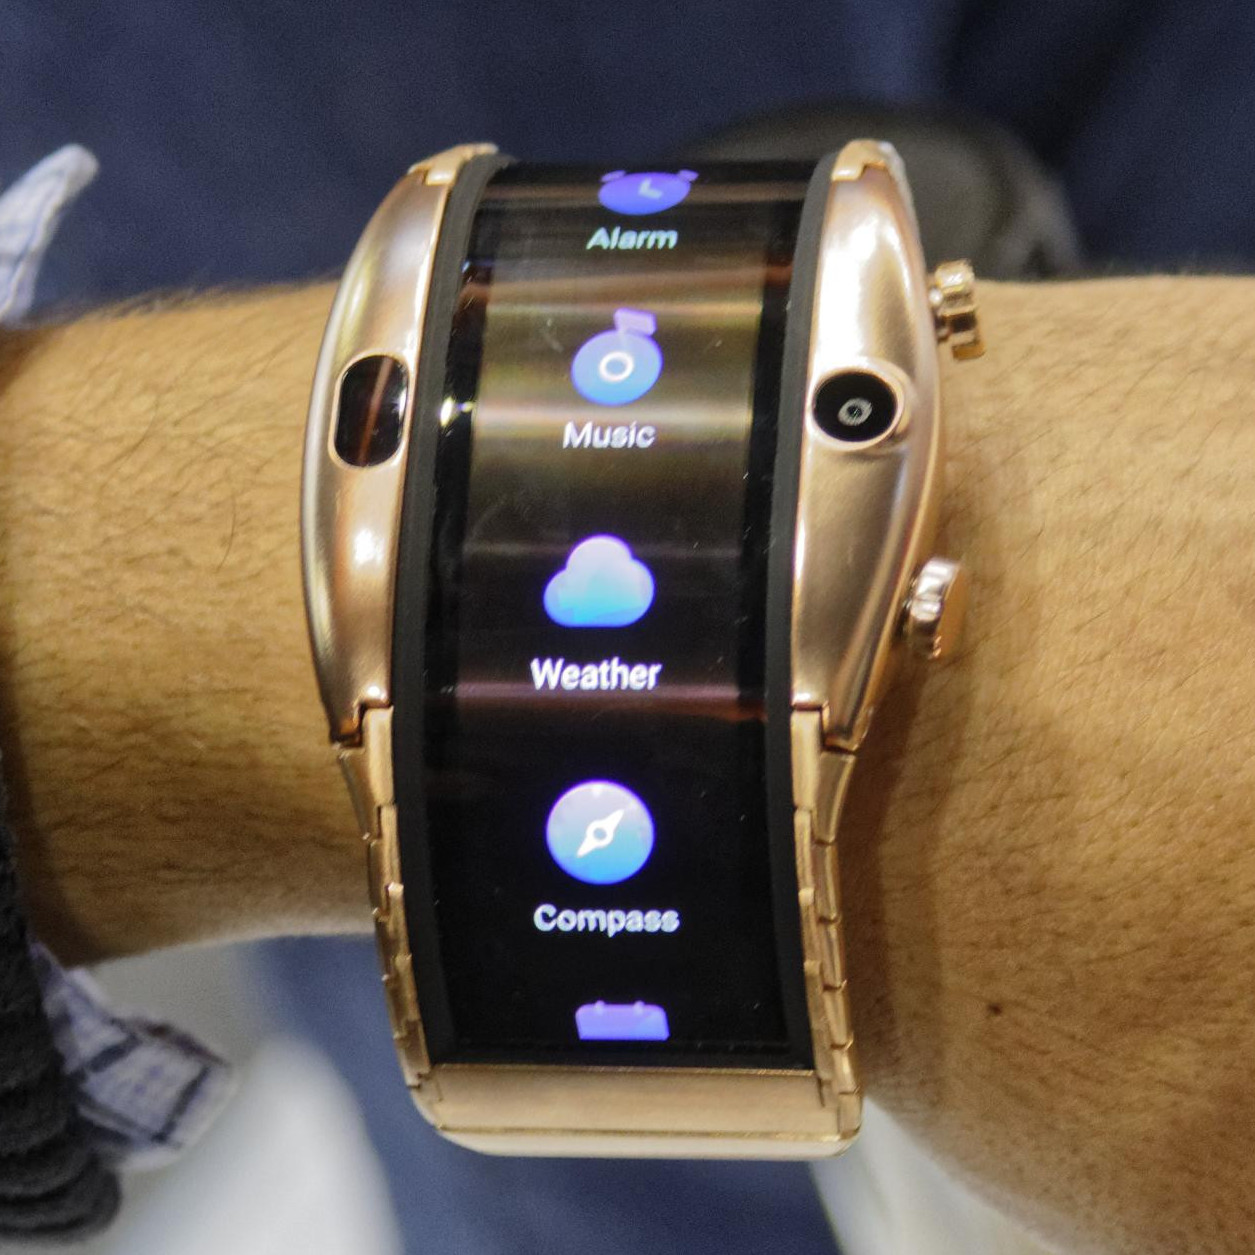 le smartphone smartwatch nubia alpha avec cran oled. Black Bedroom Furniture Sets. Home Design Ideas